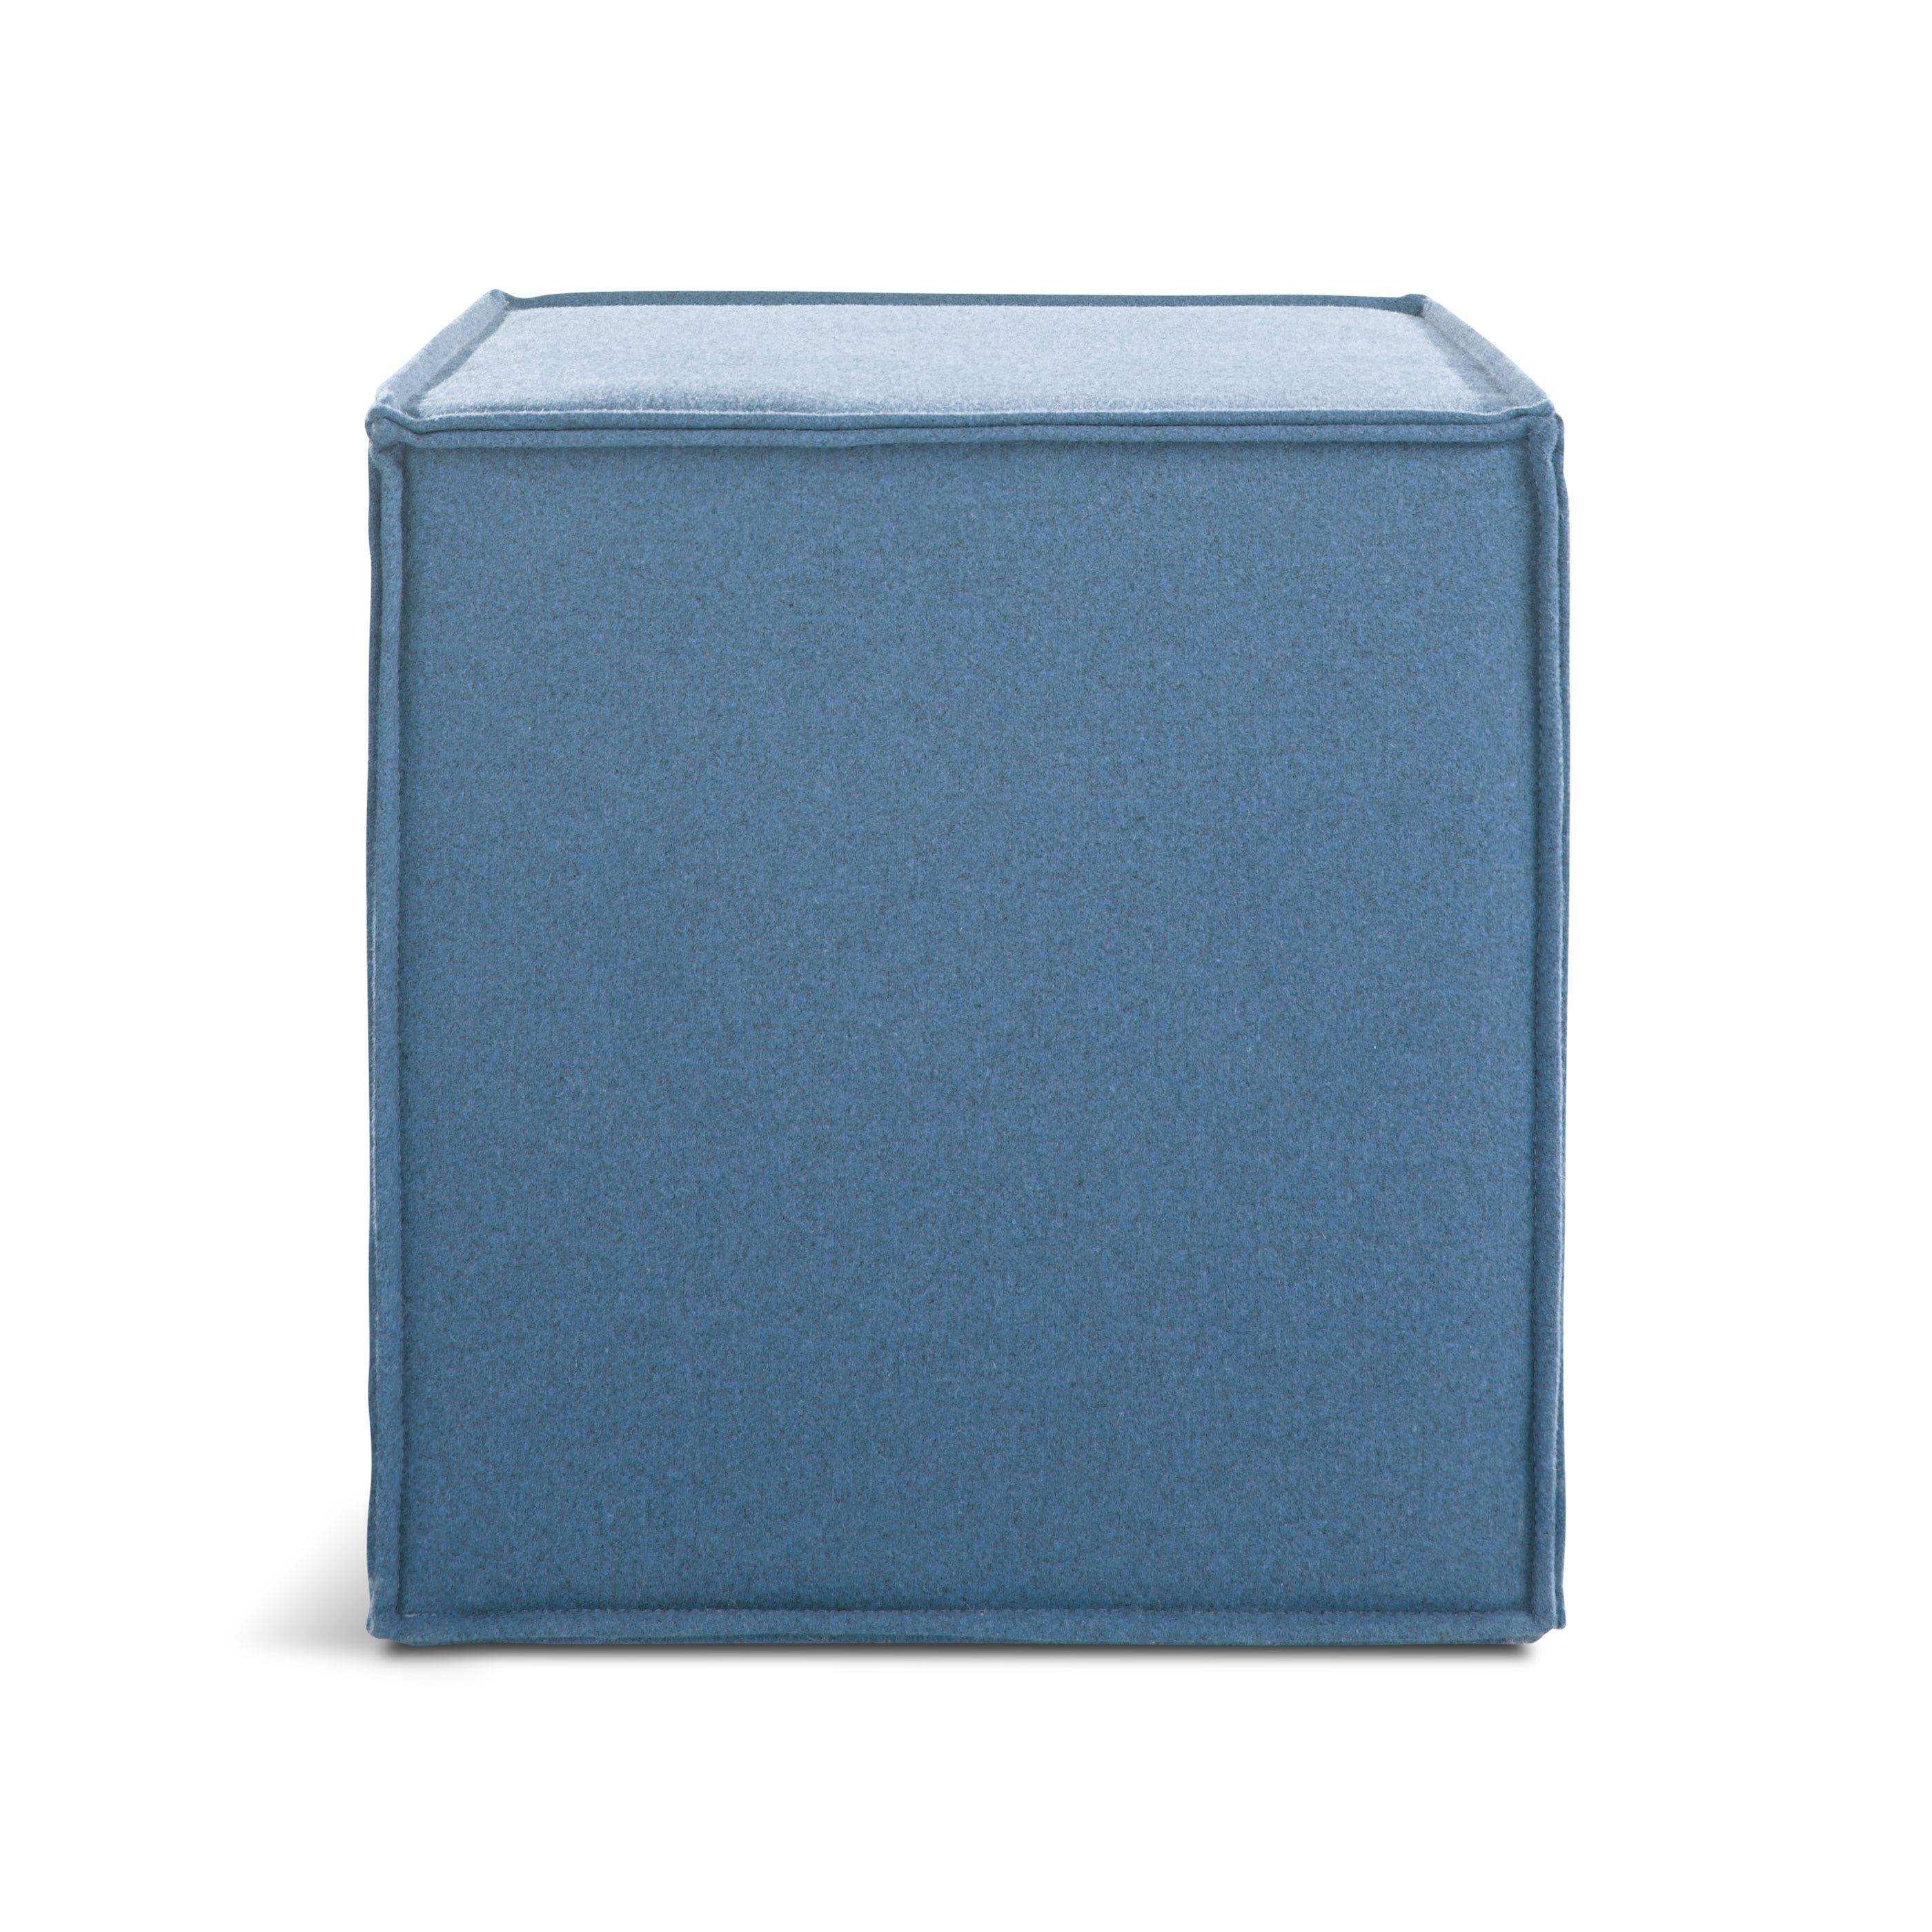 otto cube ottoman  modern cube ottoman  blu dot - previous image otto ottoman  thurmond marine blue